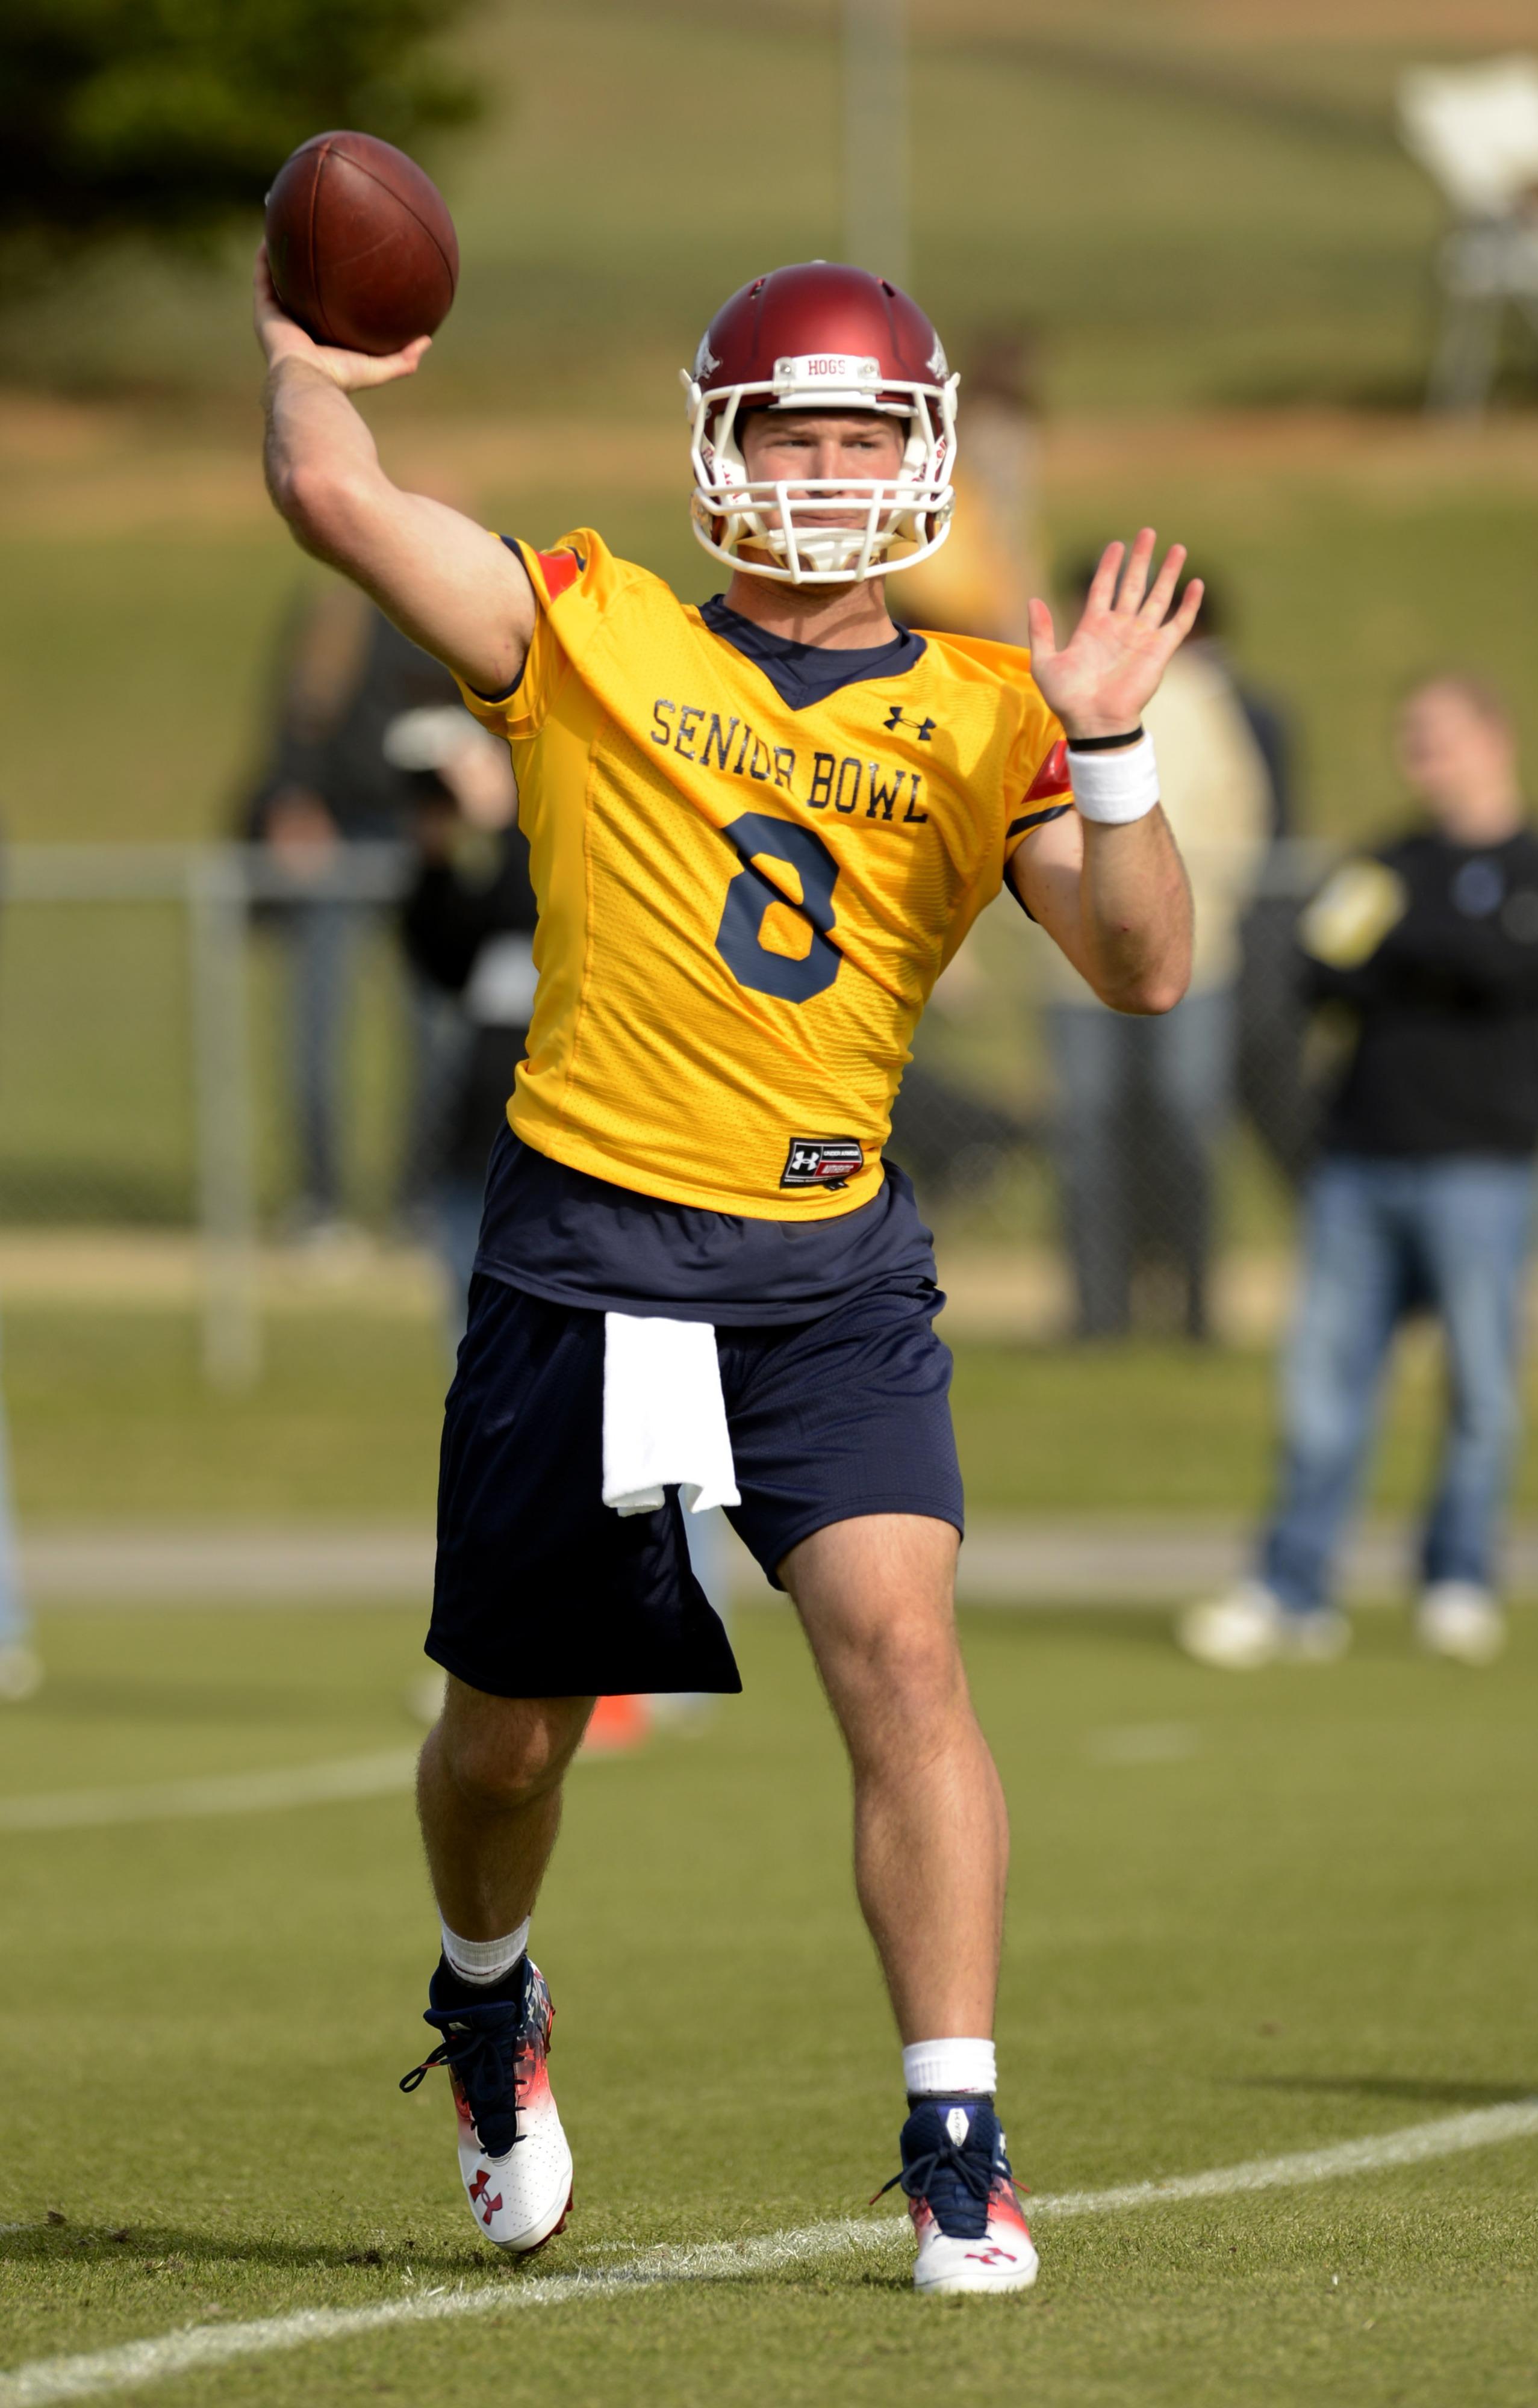 Tyler Wilson practicing at the Senior Bowl